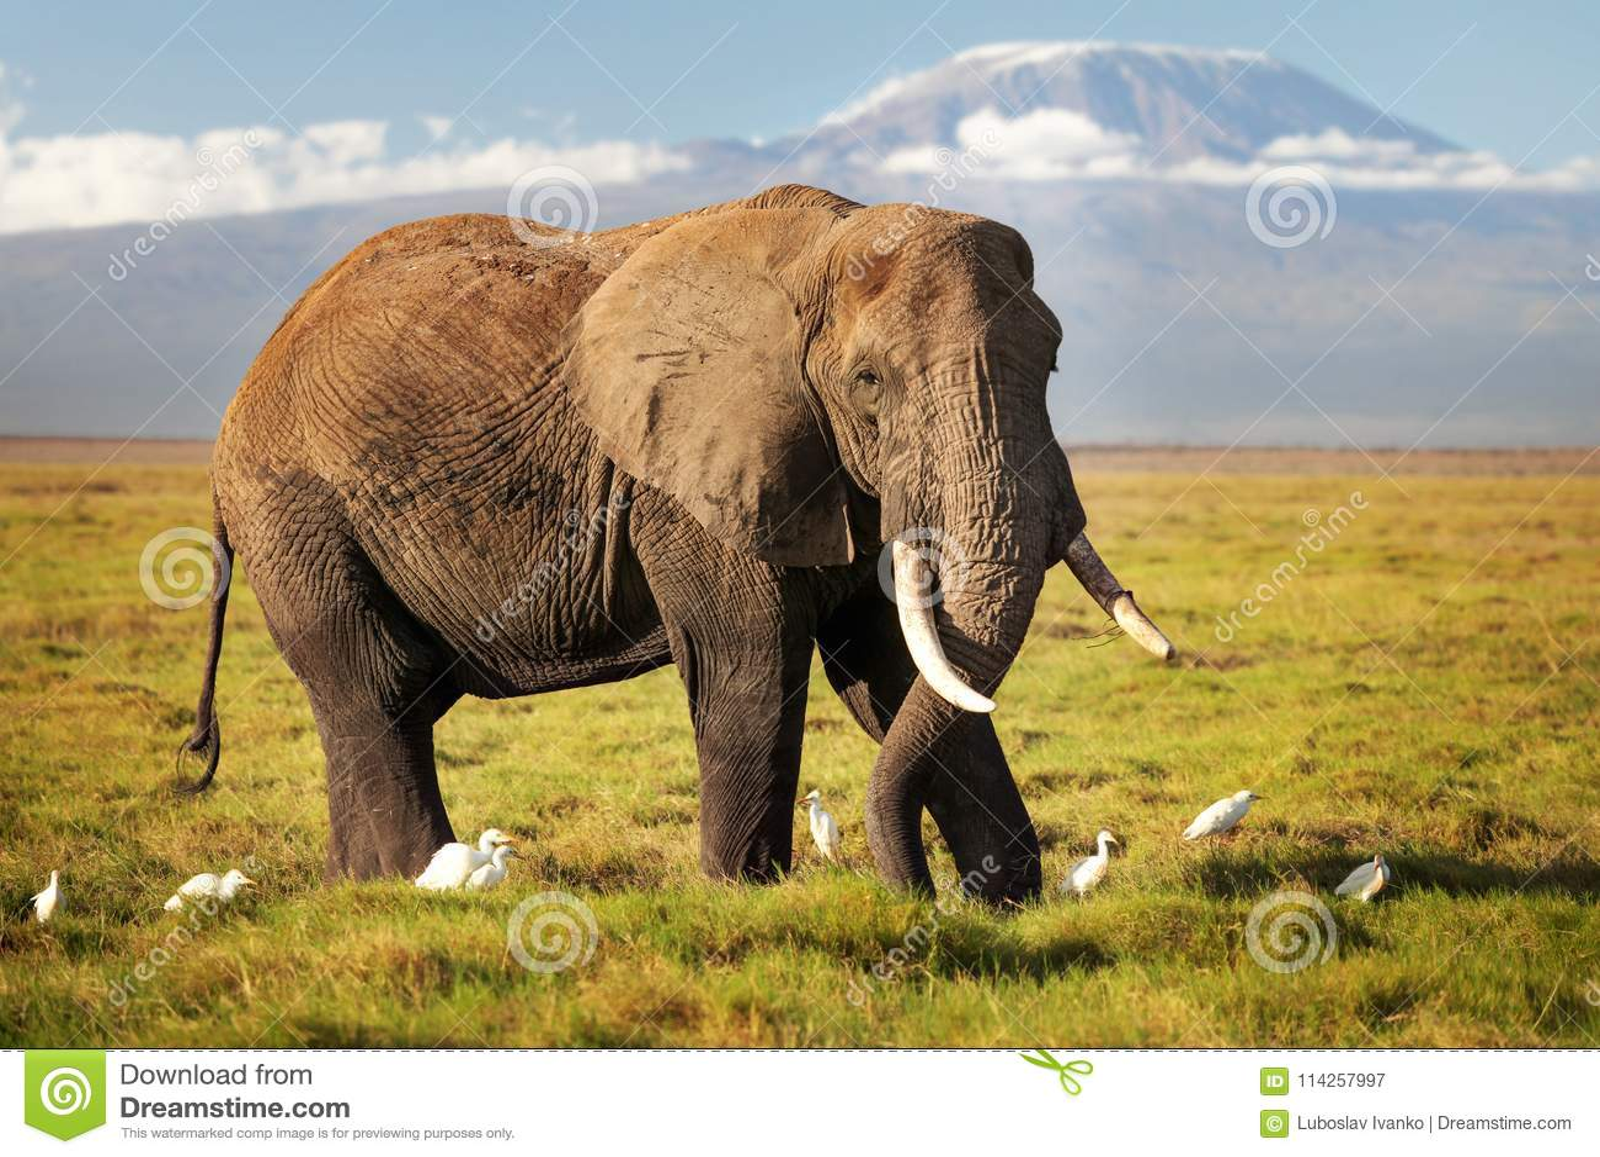 African bush elephant Loxodonta africana walking on savanna, w